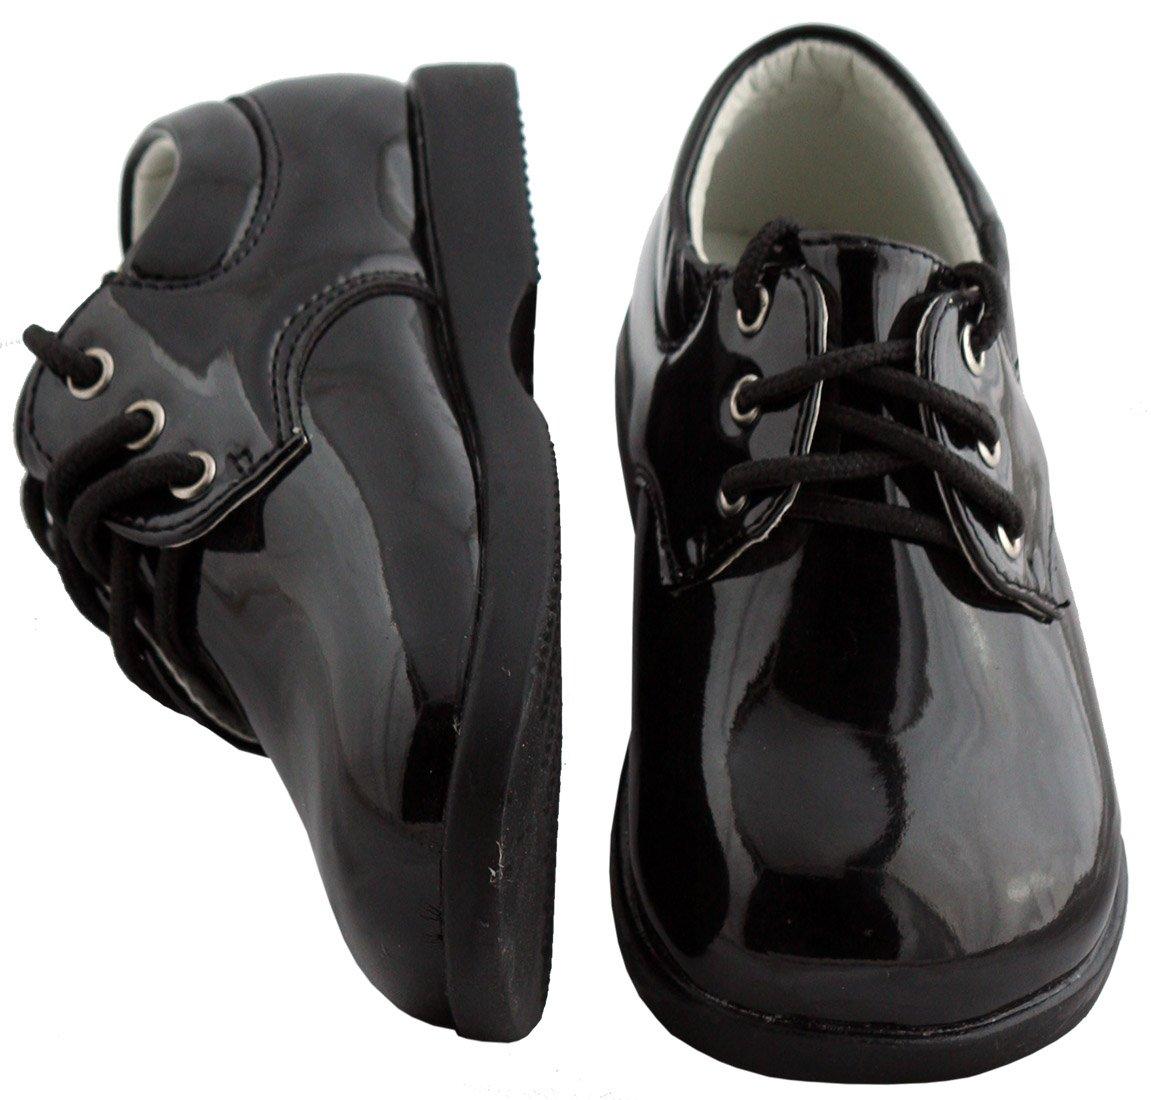 Boys Infant Toddler Black Round Toe Tuxedo Shoe by Fouger